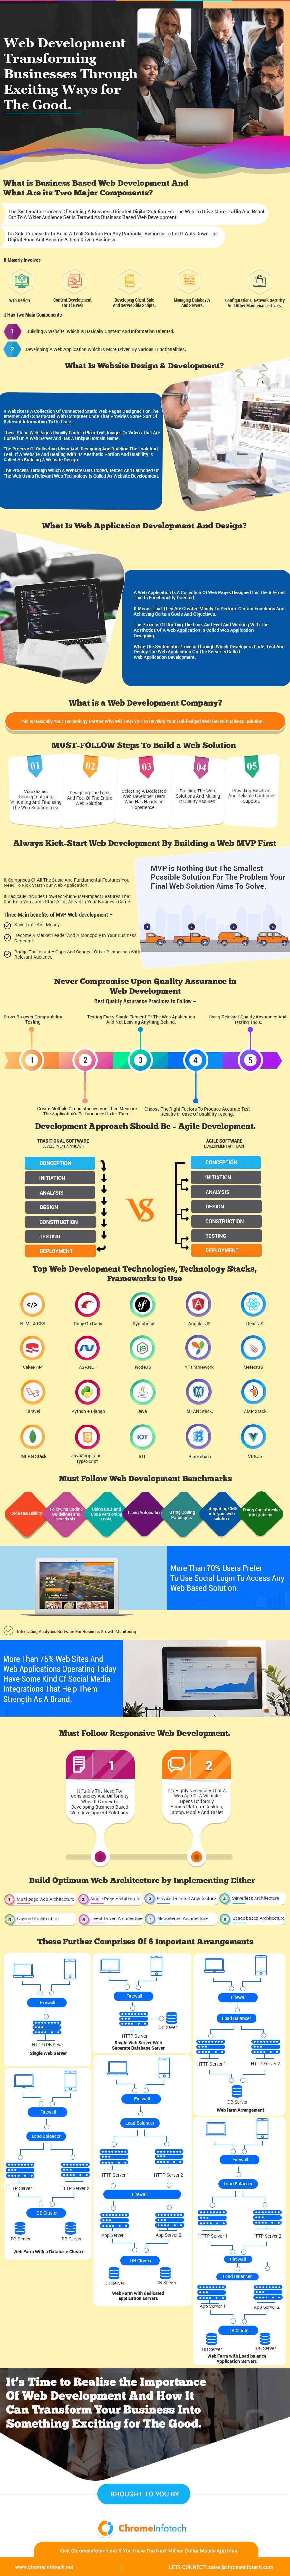 Web application development company infographic